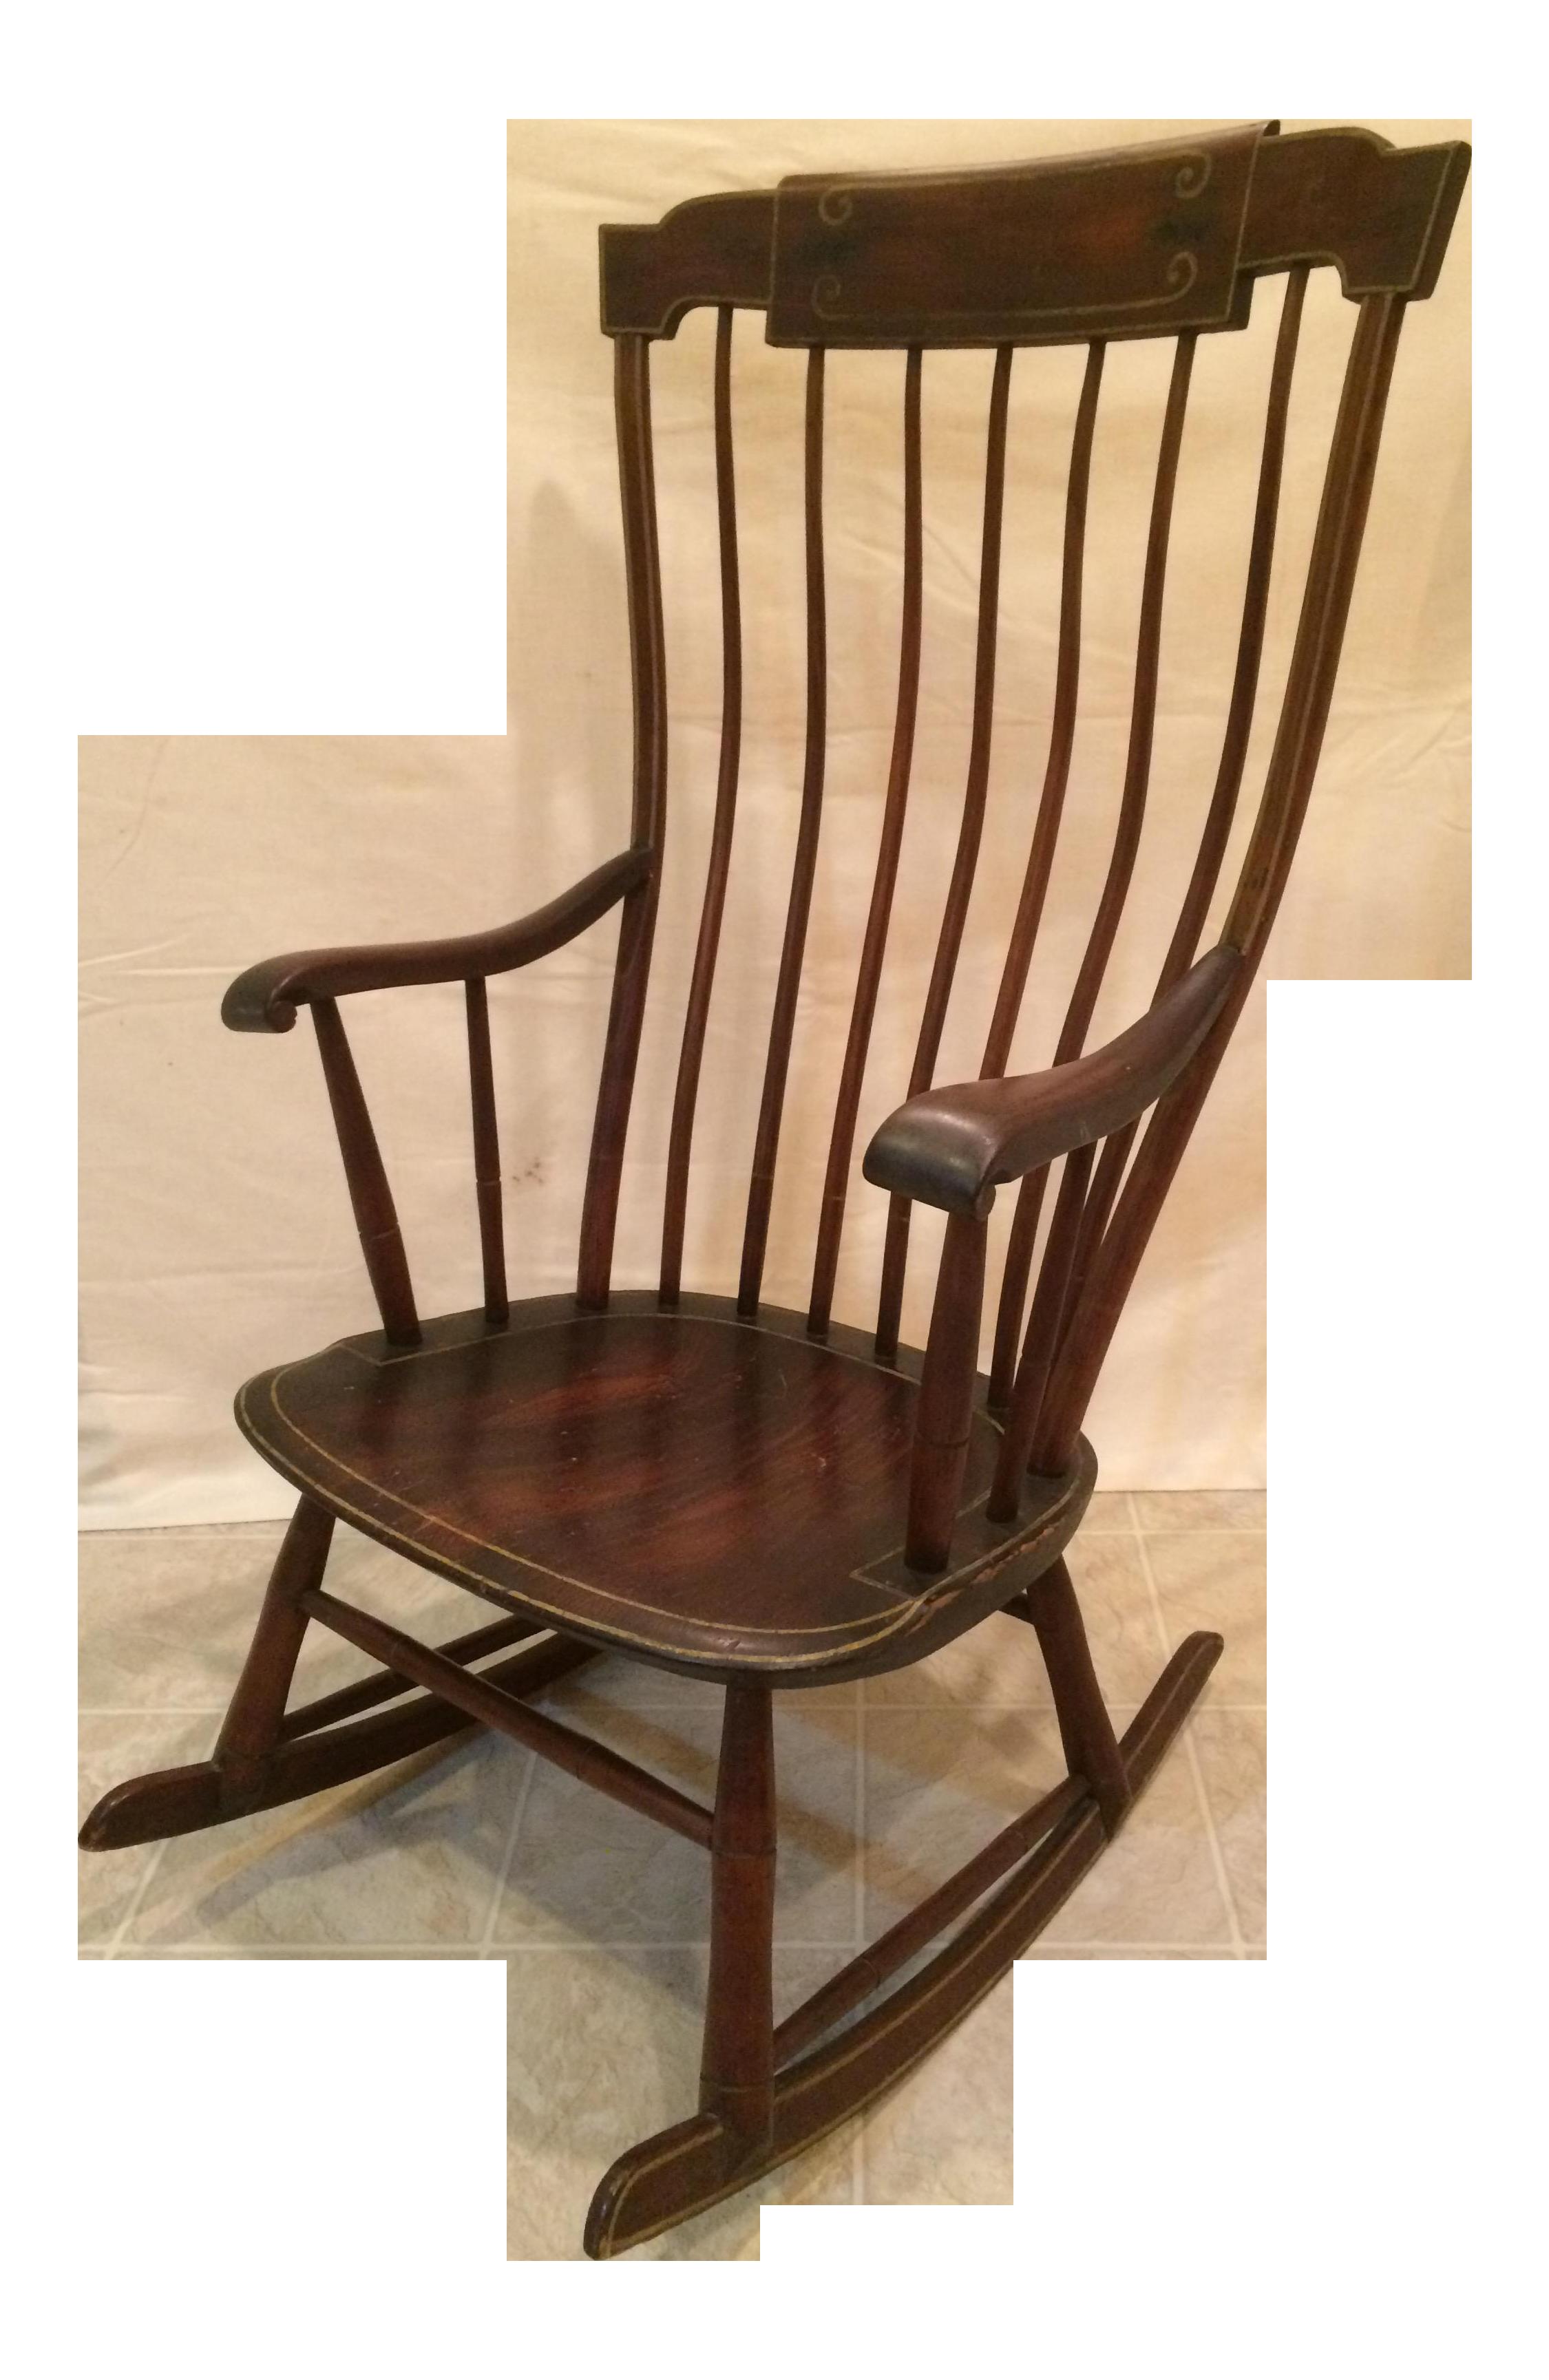 Antique Federal Period Boston Windsor Rocking Chair  sc 1 st  Chairish & Antique Federal Period Boston Windsor Rocking Chair   Chairish